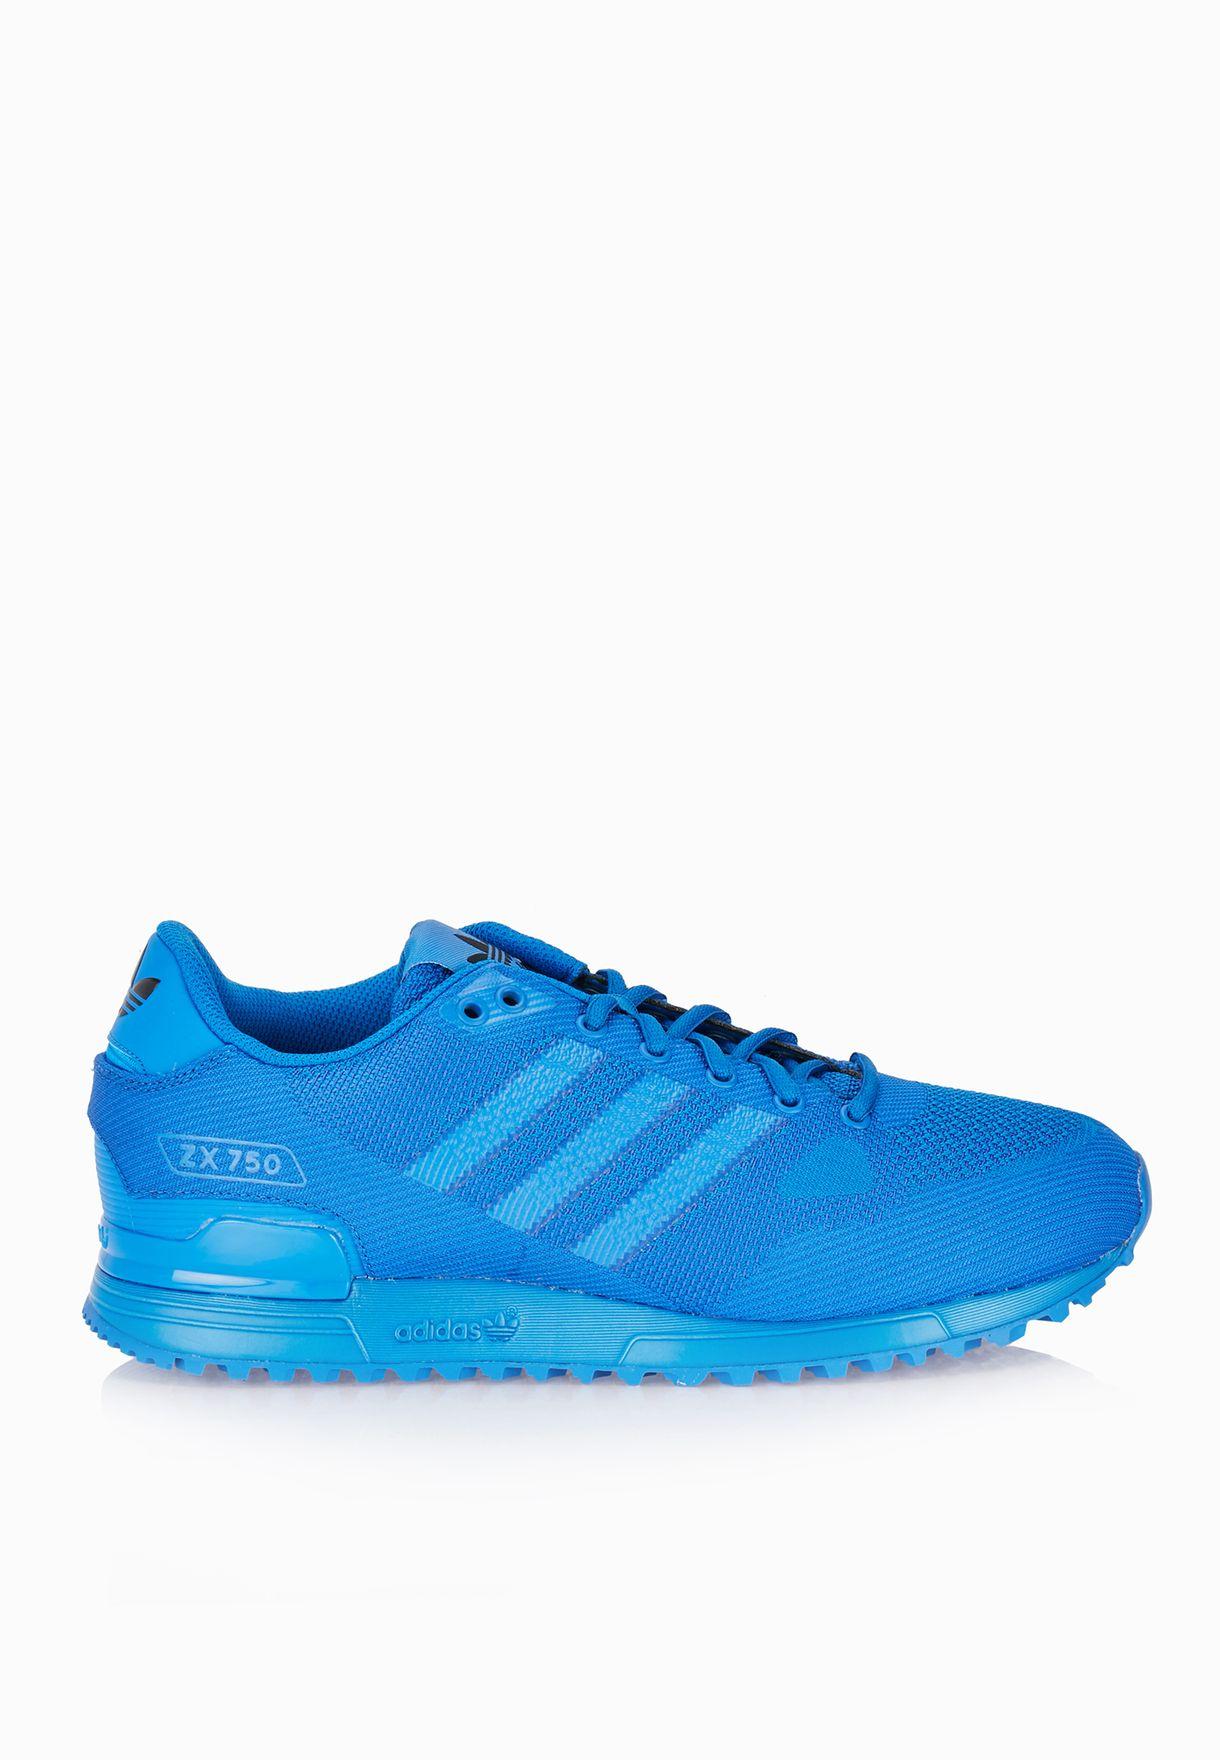 wholesale dealer f6fba a3438 ... denmark shop adidas originals blue zx 750 wv s80127 for men in uae  ad478sh28ylb 2c822 378b7